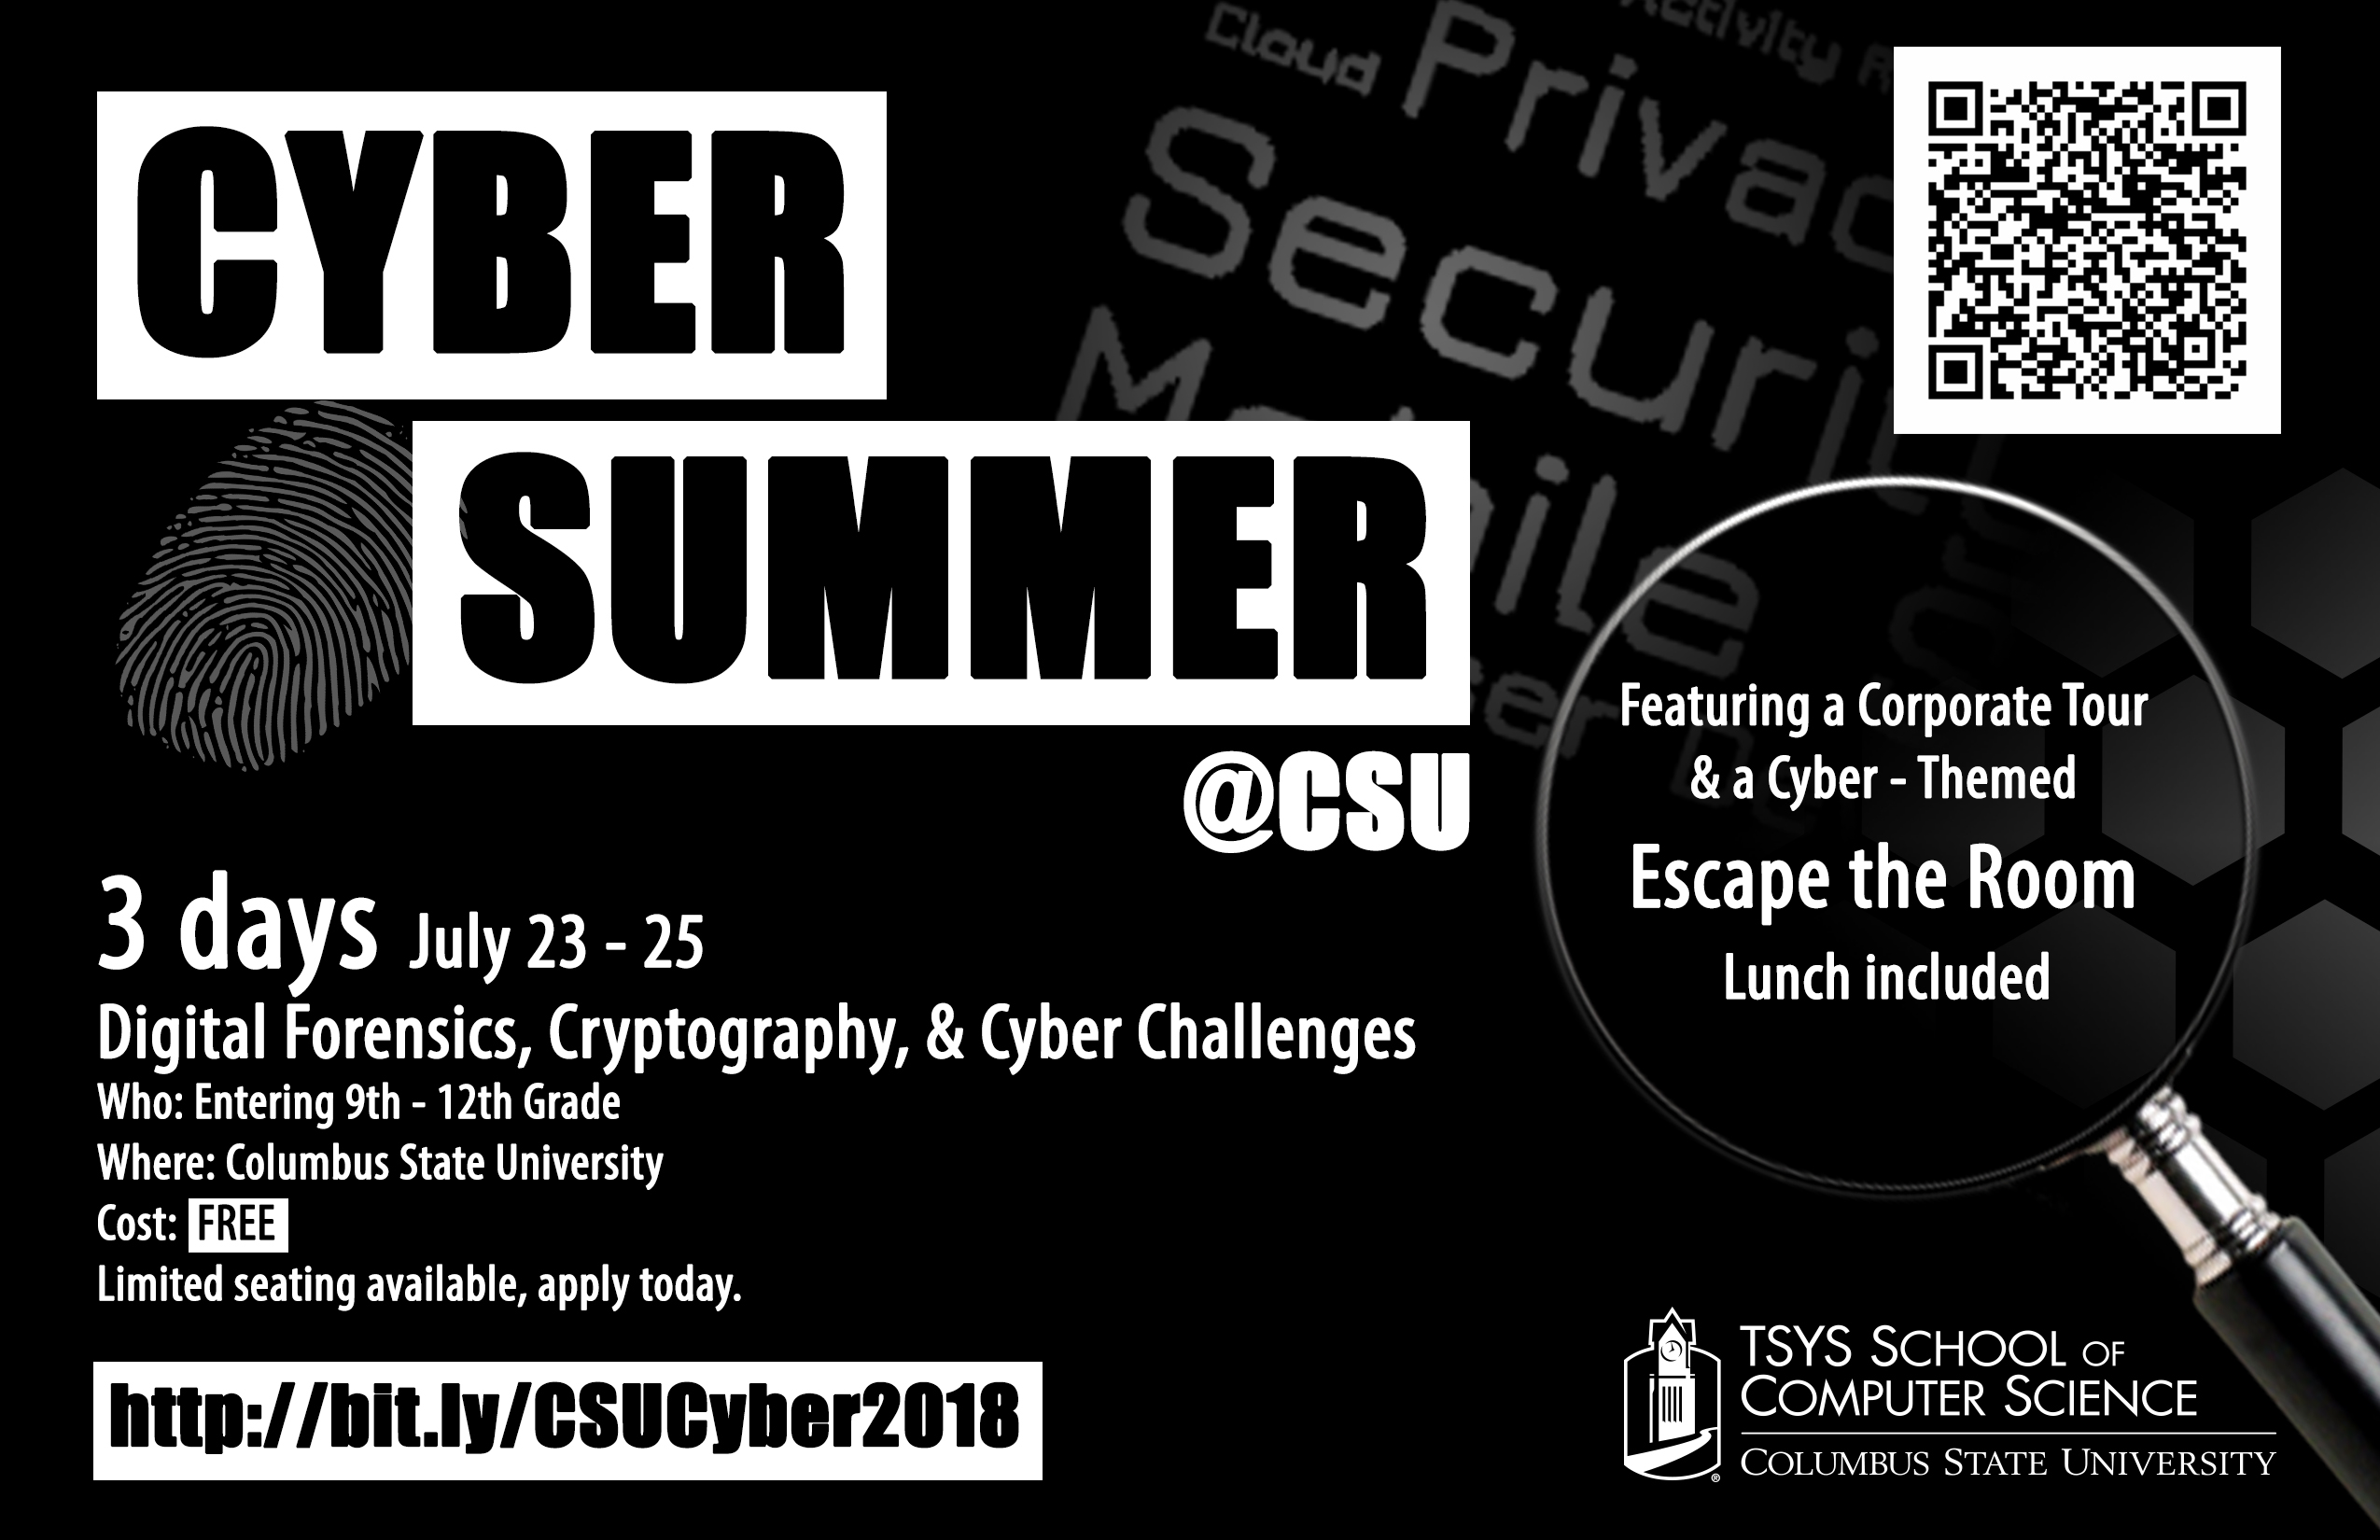 Cyber Summer @ CSU